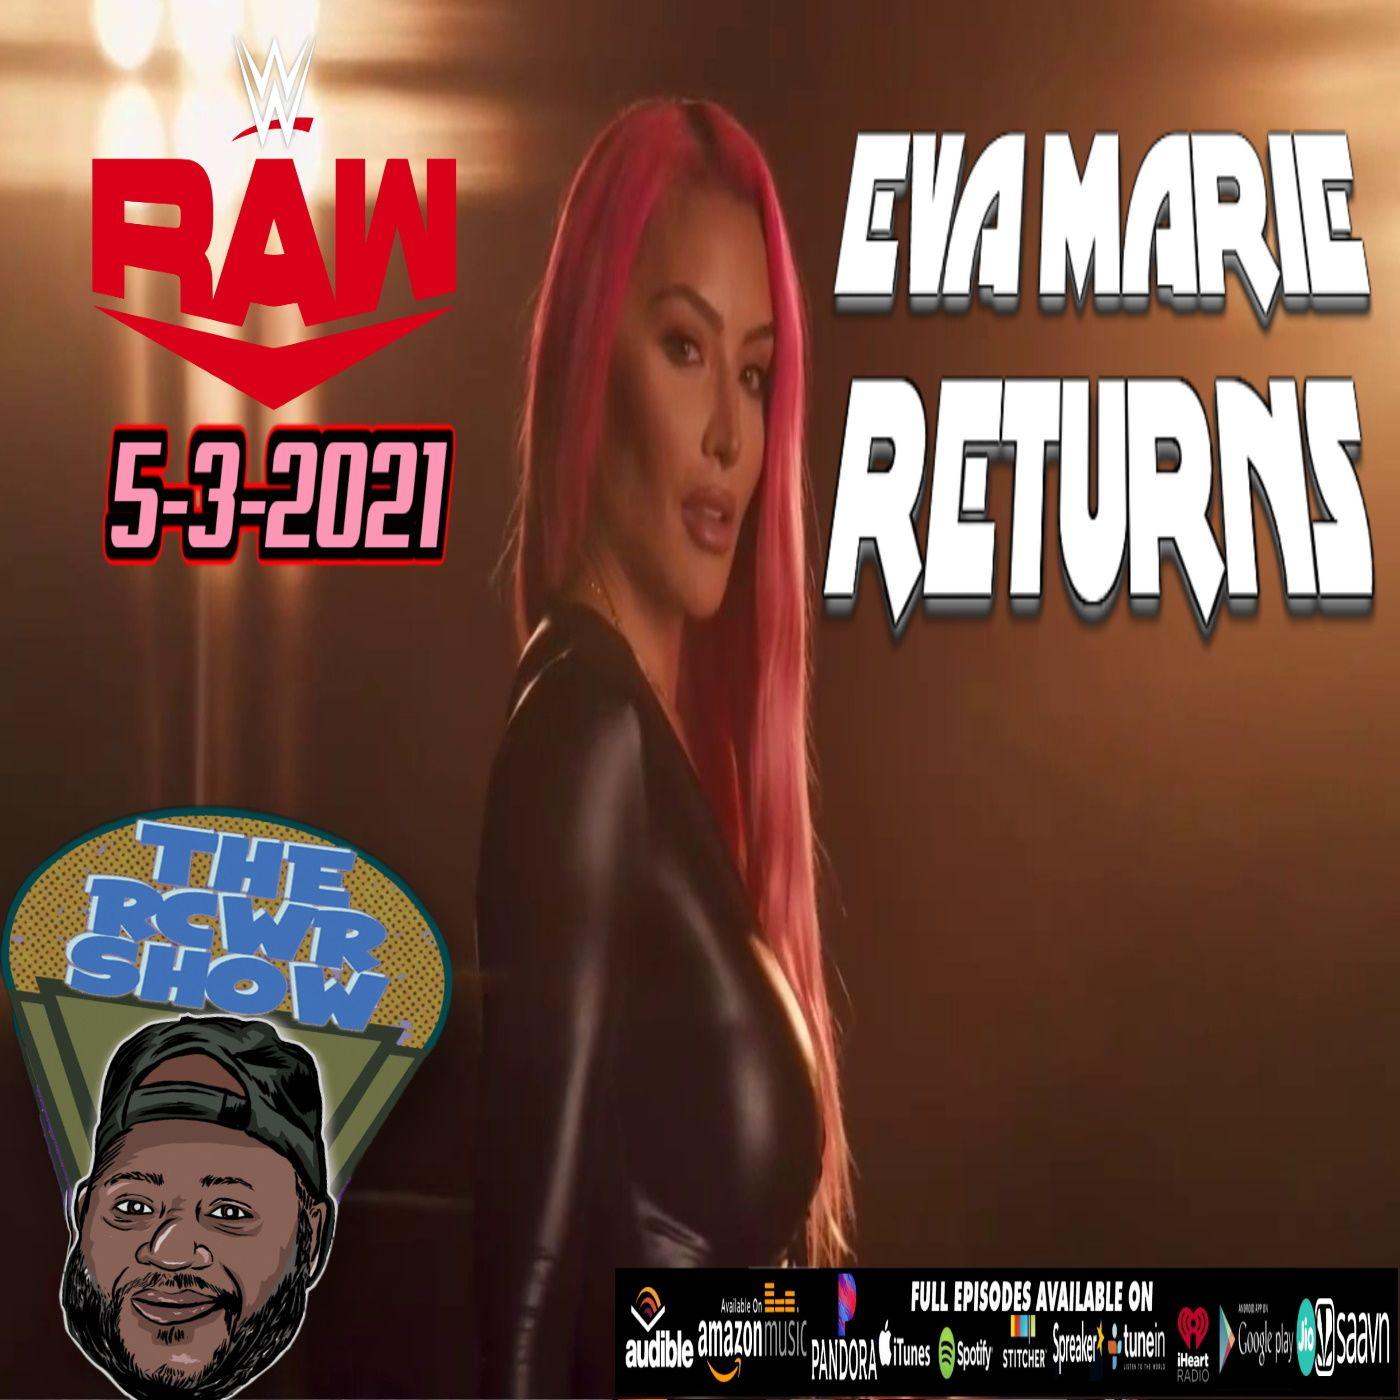 Matt Hardy vs Jim Cornette, RAW, Some Awesome Good News | The RCWR Show 5-3-2021